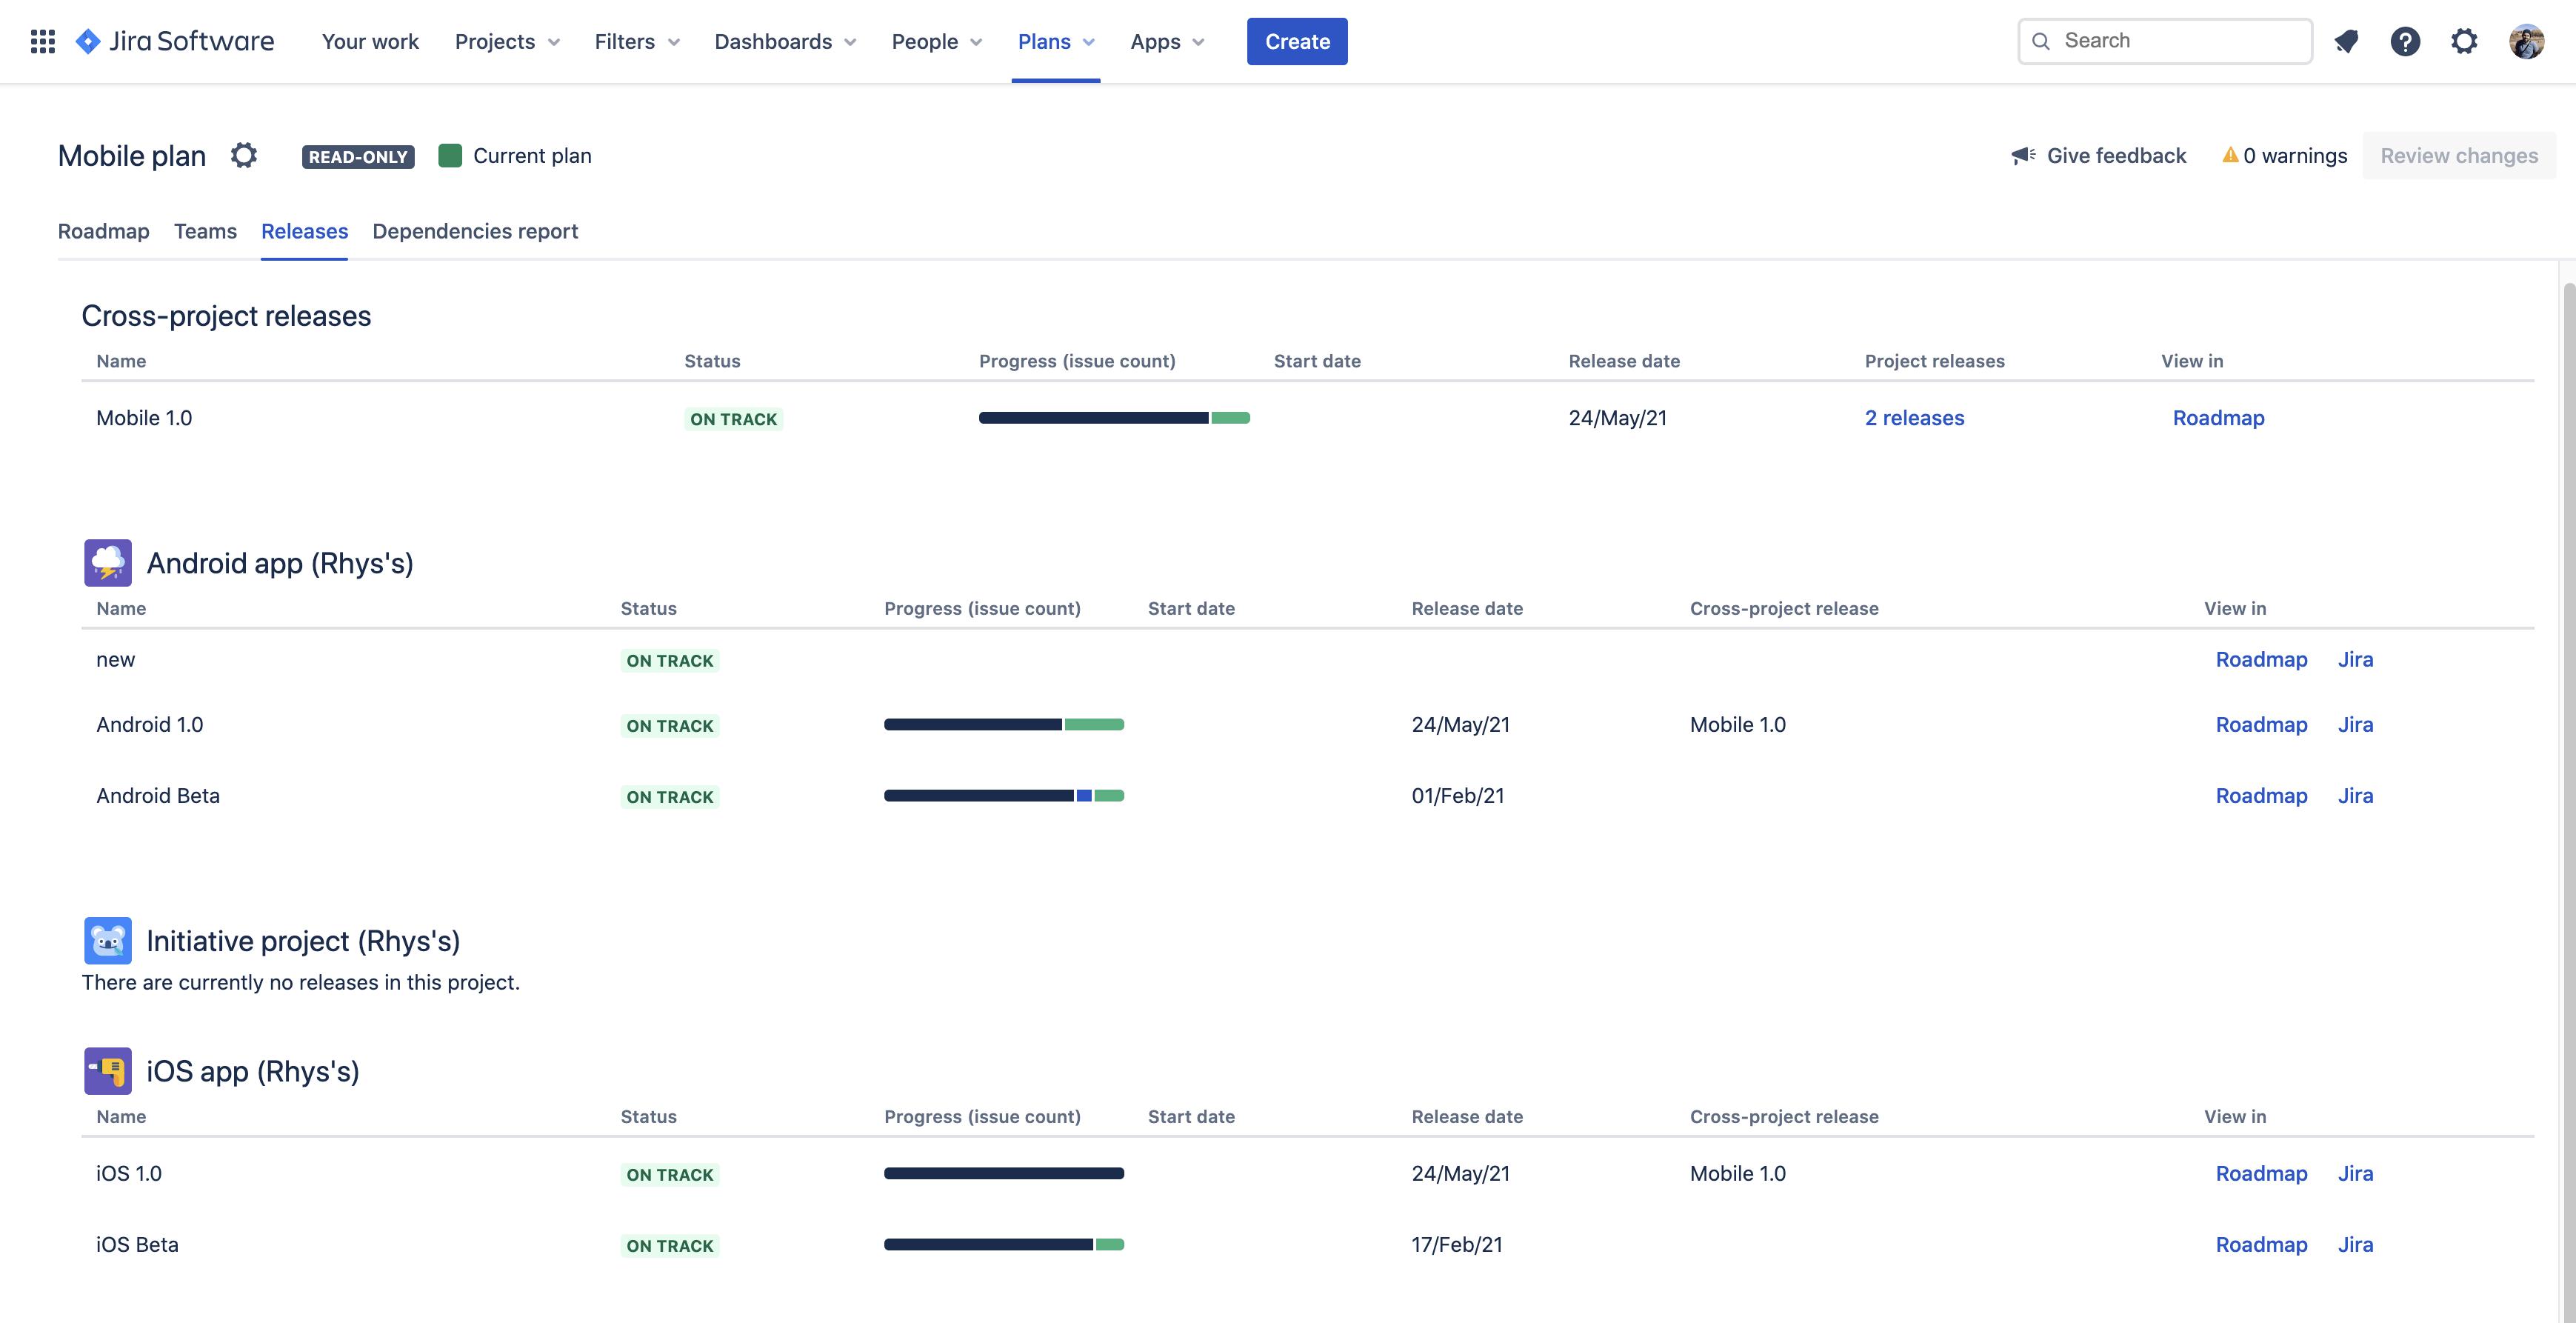 Tabblad Advanced Roadmap-releases